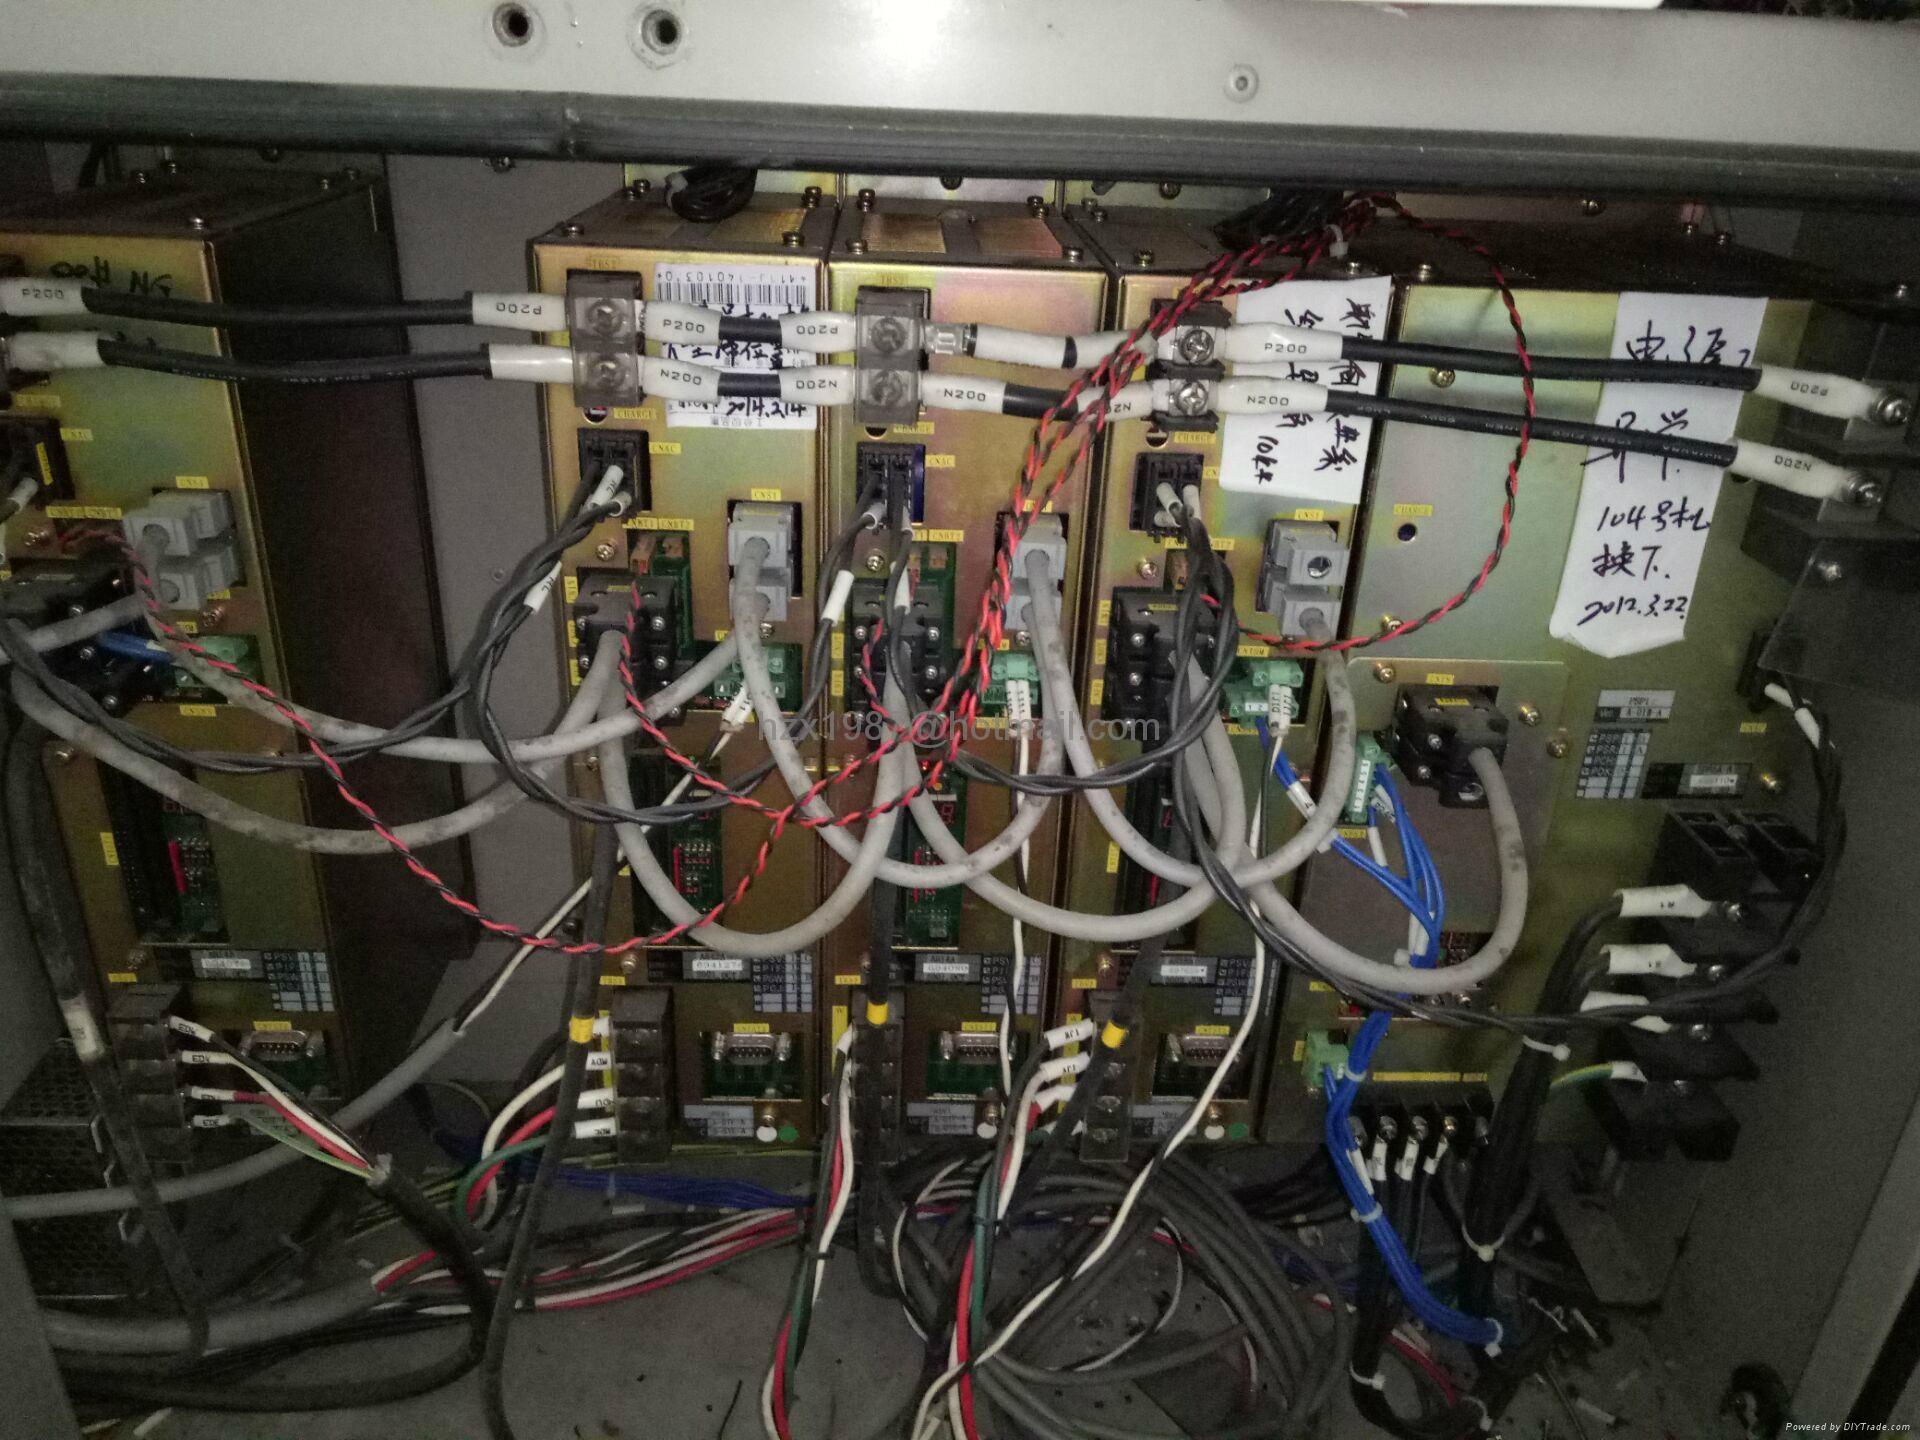 销售及维修显示器V30 ,V21 ,V710,东芝EC40NII-1Y EC40 NII-1Y机维修 8